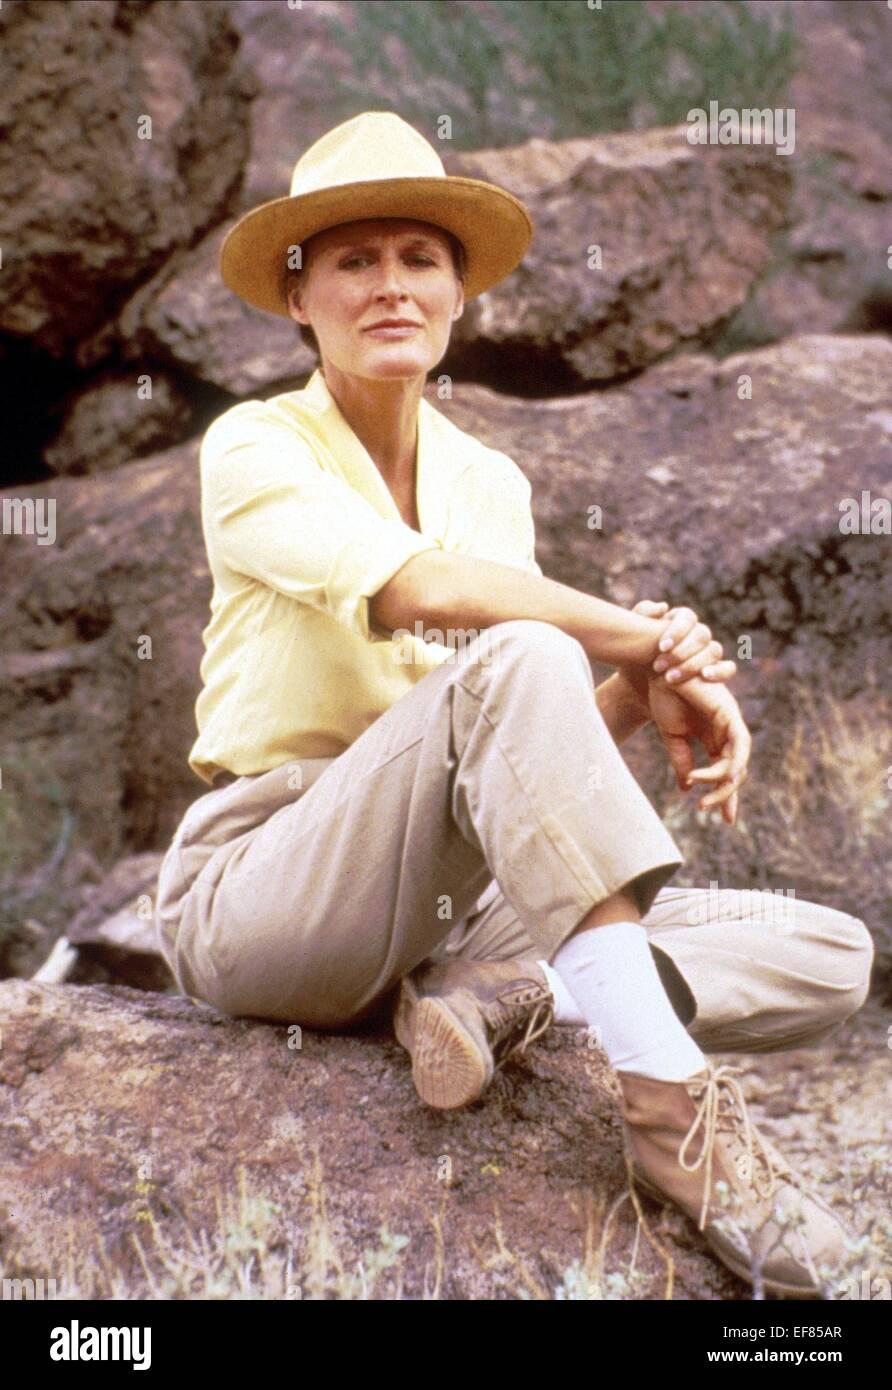 GLENN CLOSE THE STONES OF IBARRA (1988) - Stock Image